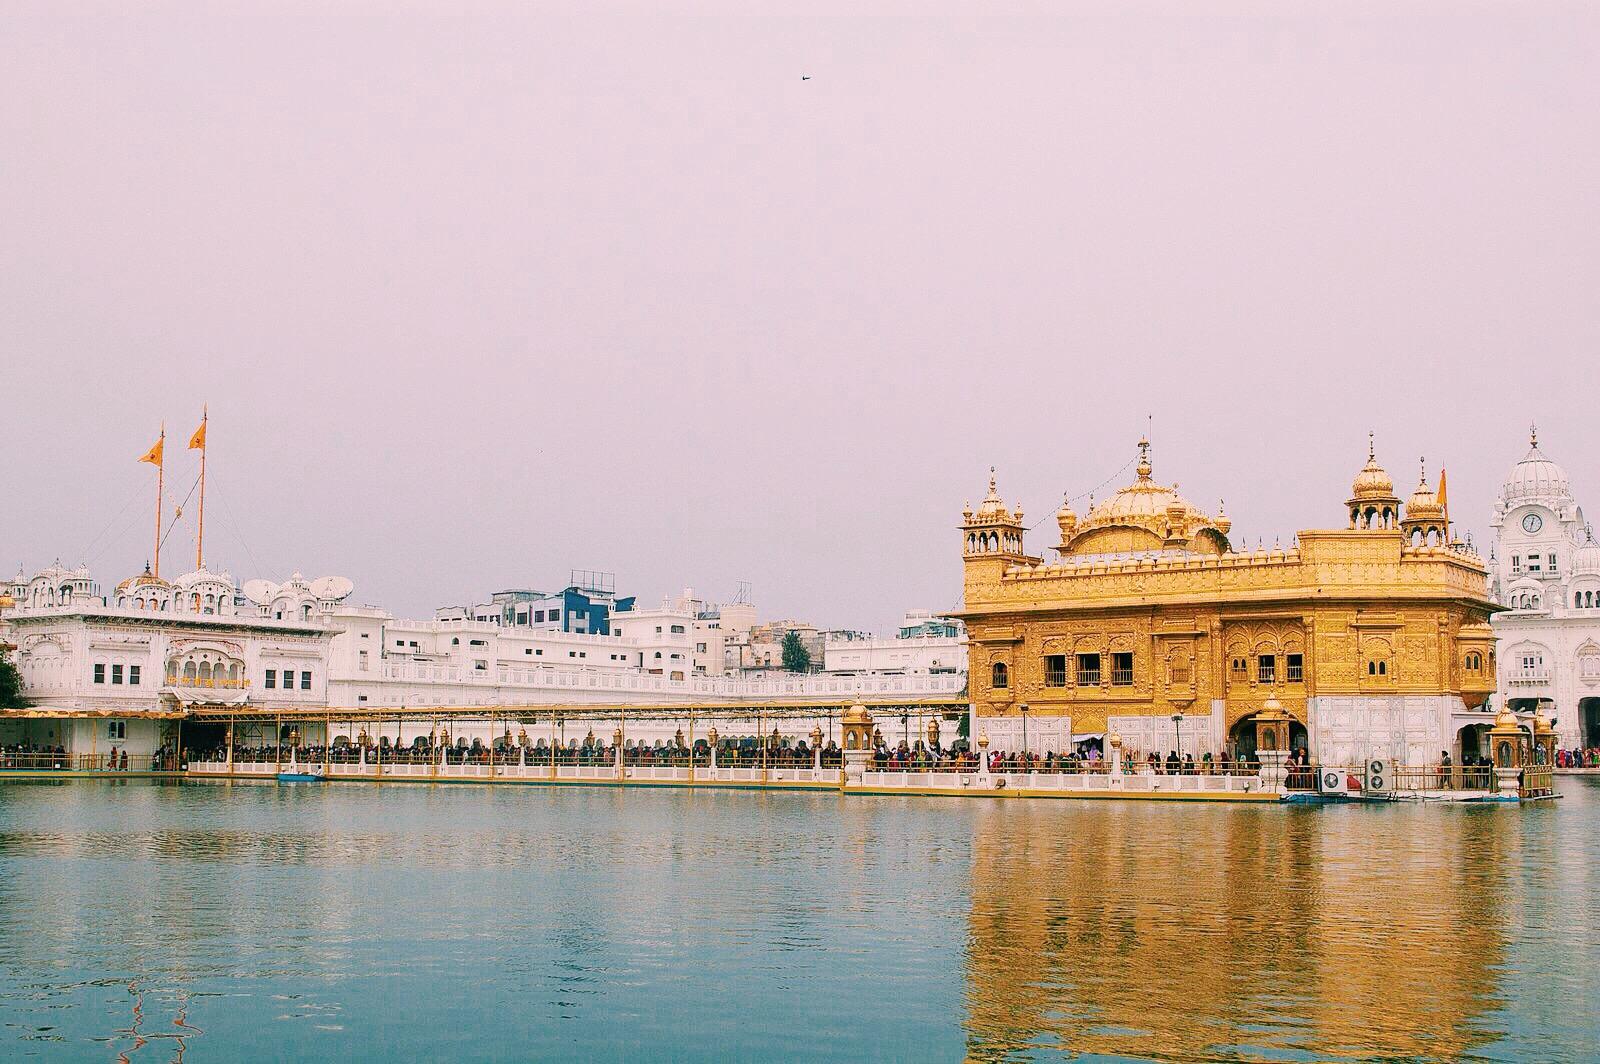 The Harmandir Sahib Complex